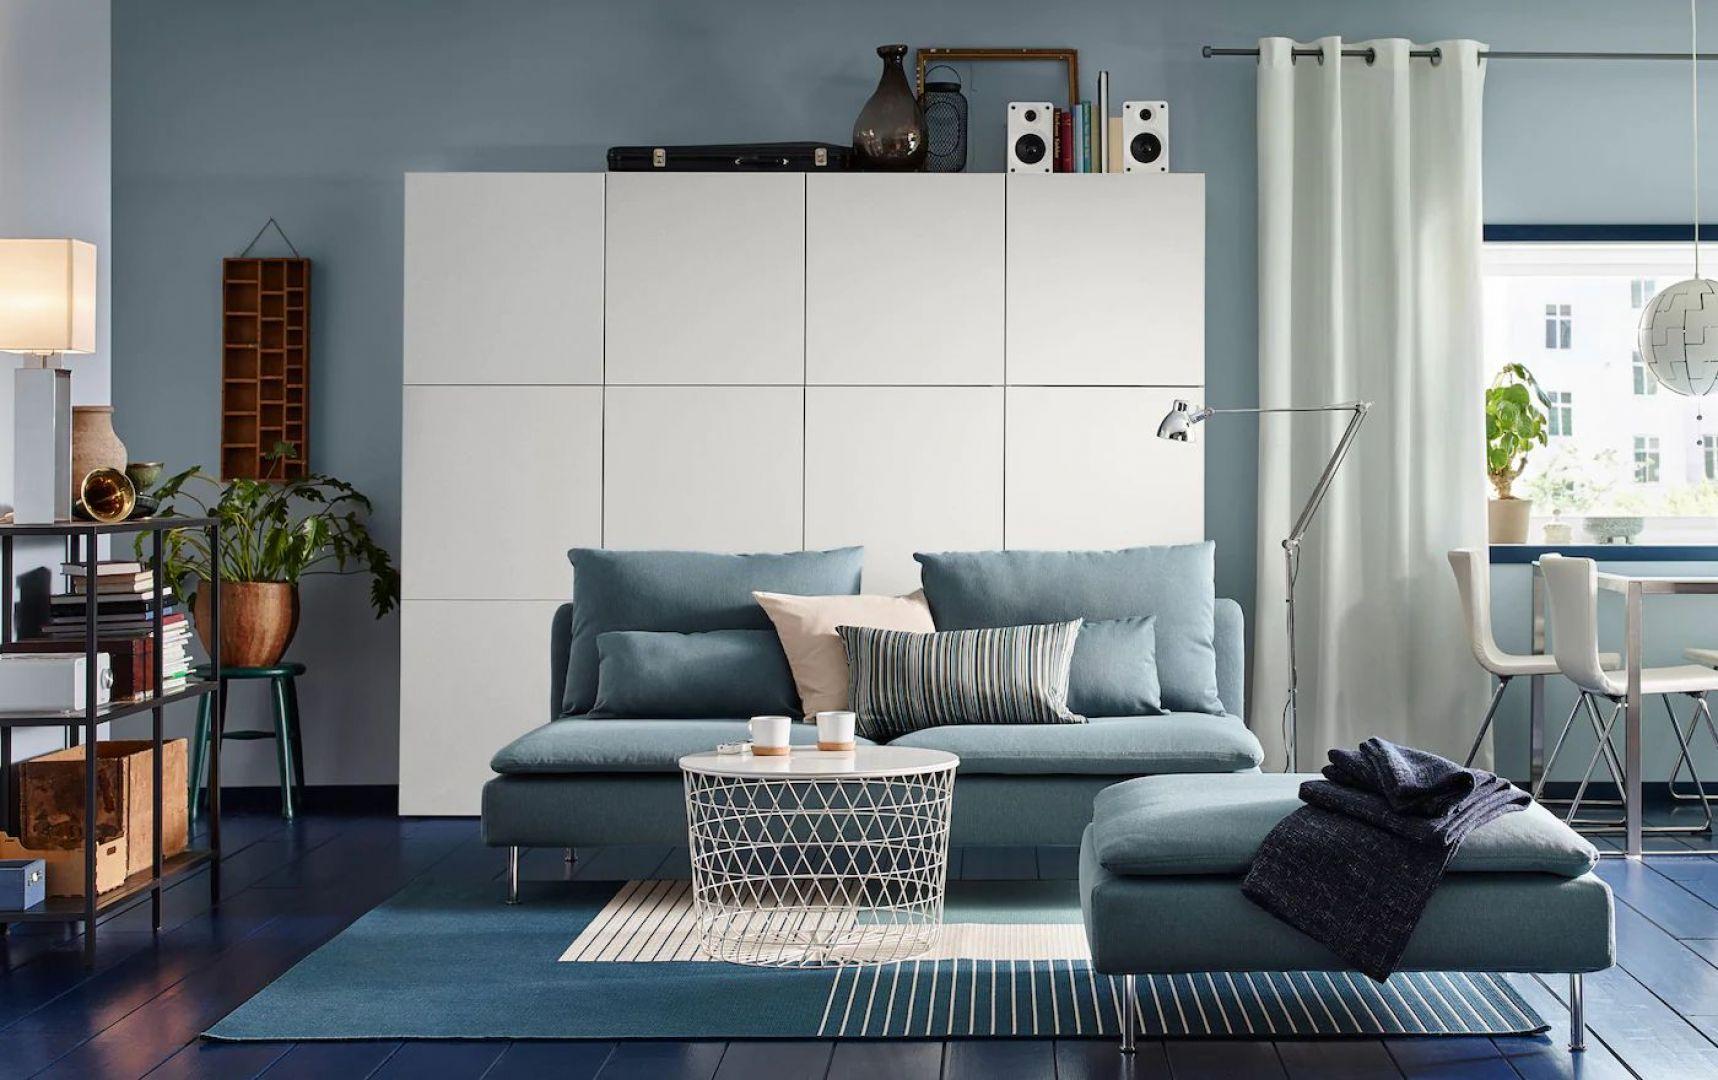 Meble do salonu dostępne w ofercie IKEA: szafa z kolekcji Eket, sofa z kolekcji Soderman, stoliki z kolekcji Kvistbro. Fot. IKEA